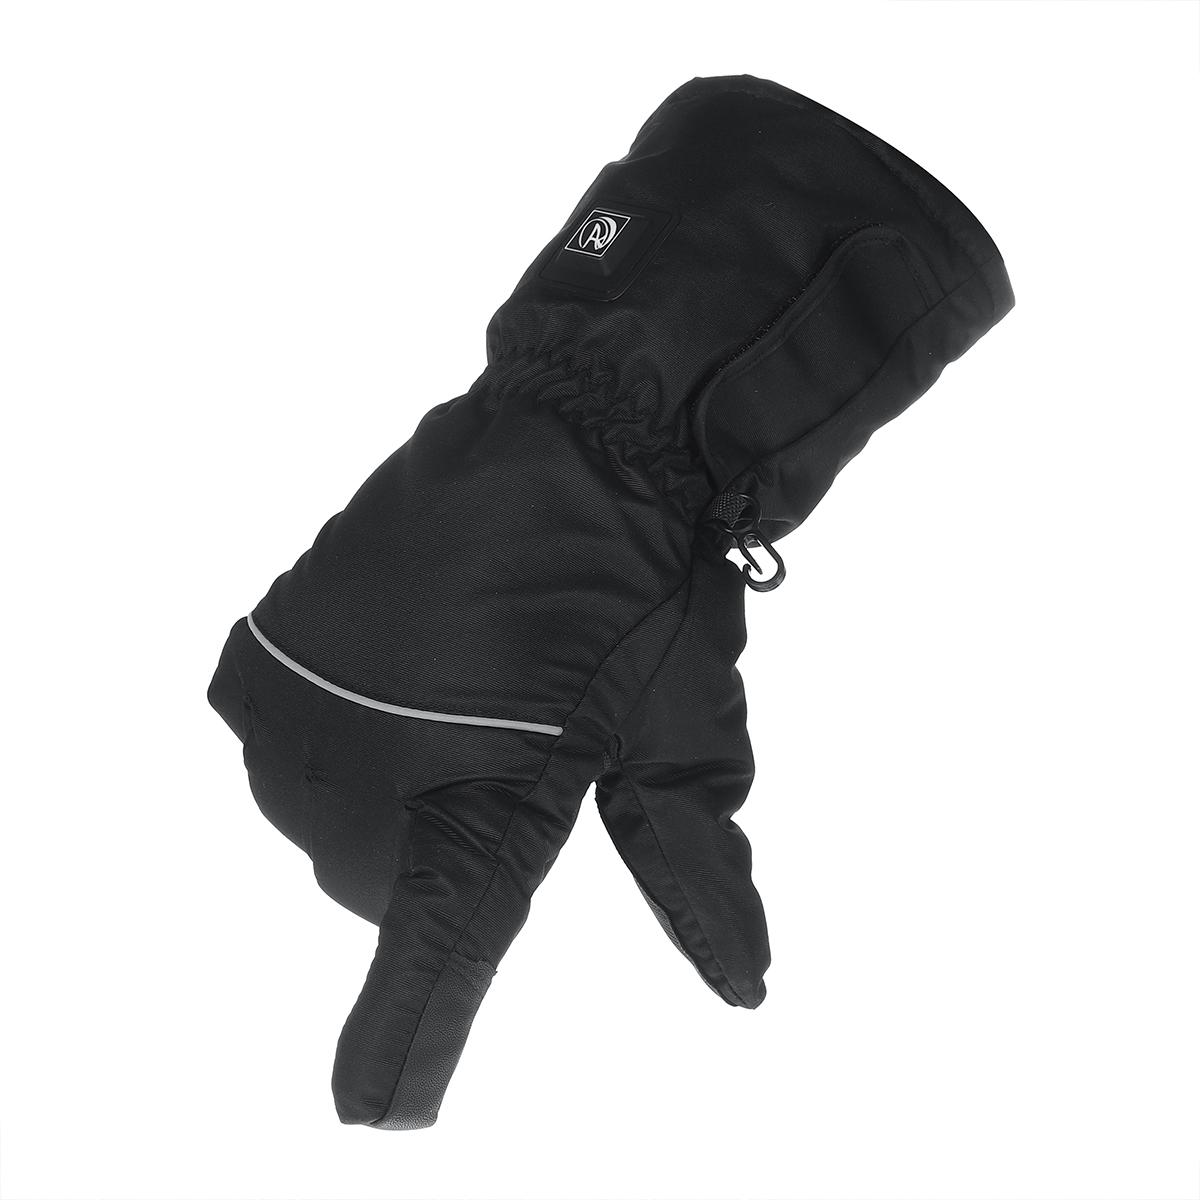 Electric Windproof Touch Screen Running Gloves 3 Models Adjustable Men Women Winter Fleece Thermal Warm Sport Gloves Anti-slip Cycling Outdoor Gloves